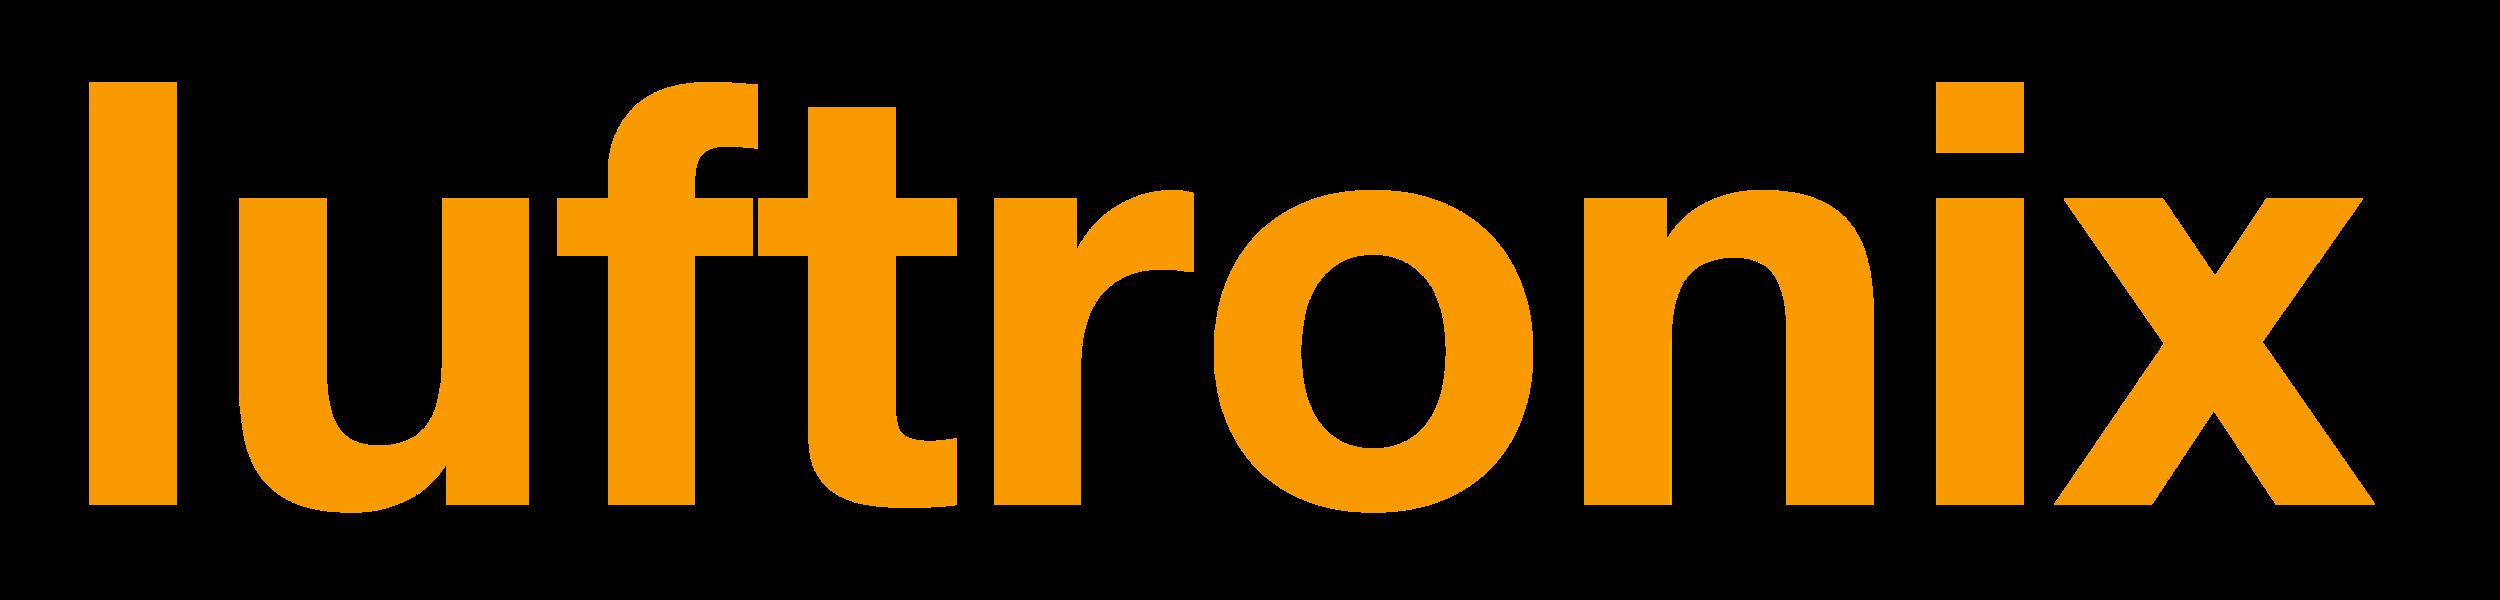 logo_trans_xl.png